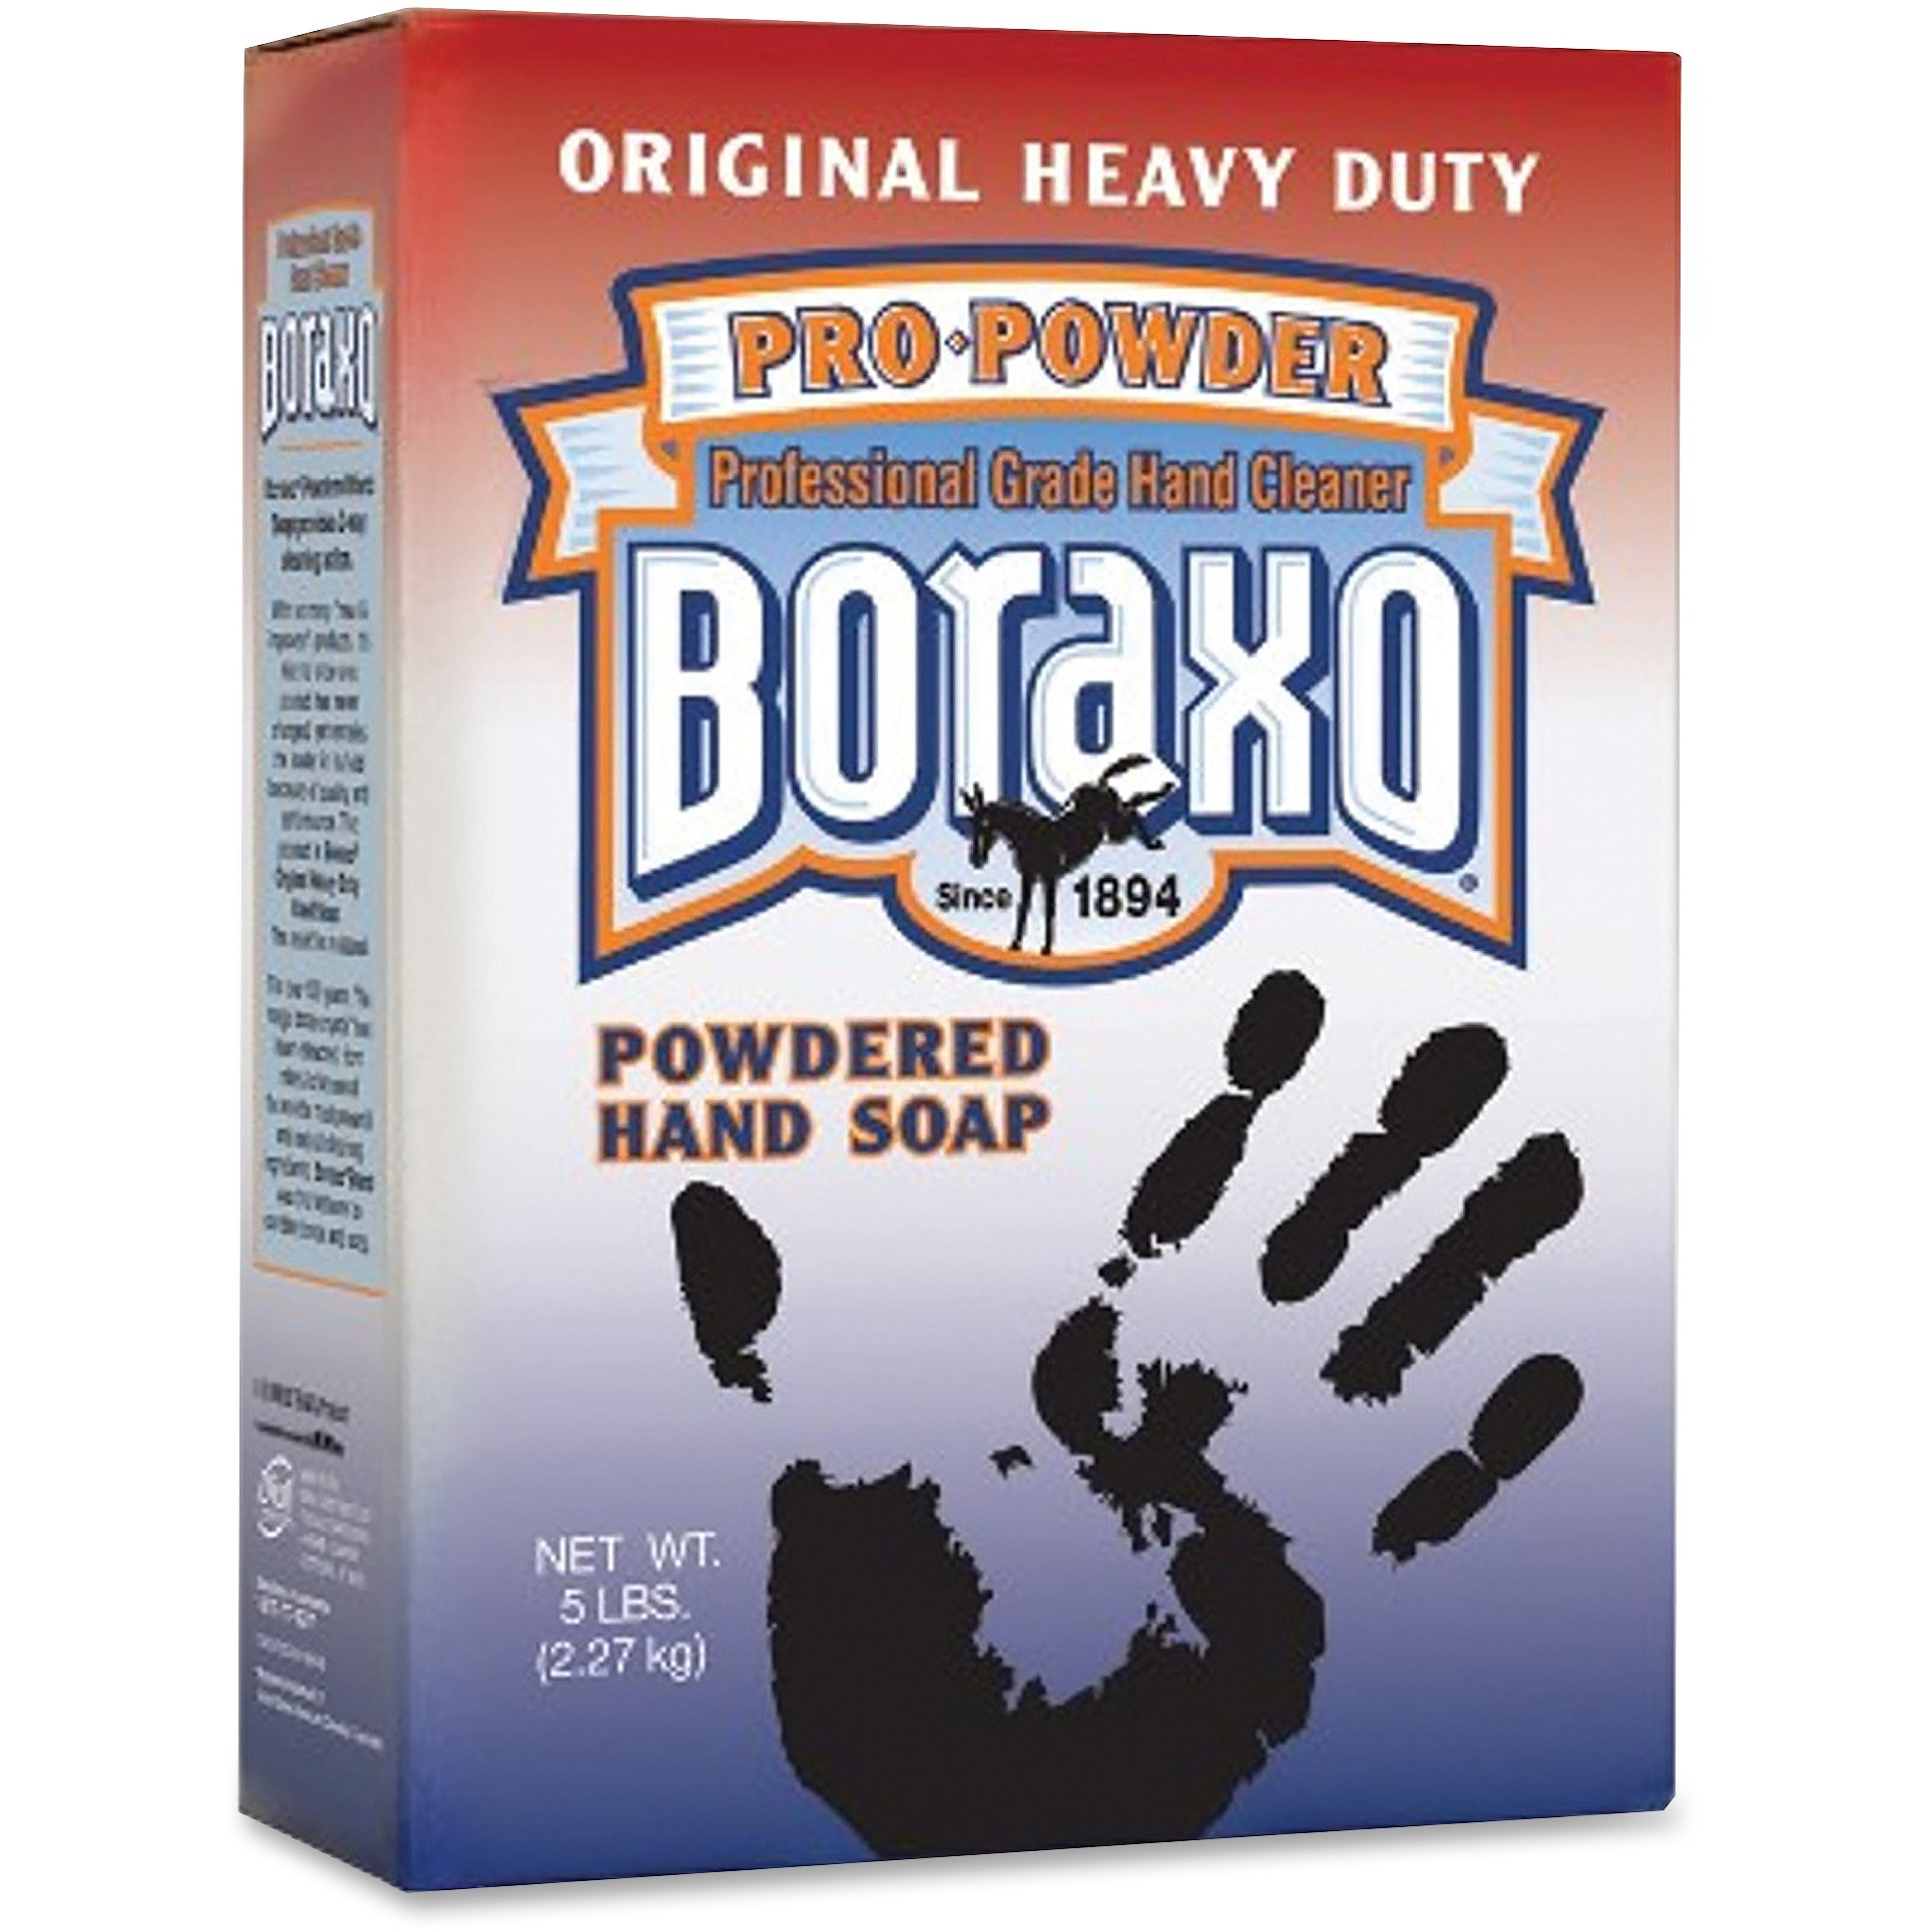 Boraxo Pro-Powder Professional Grade Powdered Hand Soap, 5 lbs